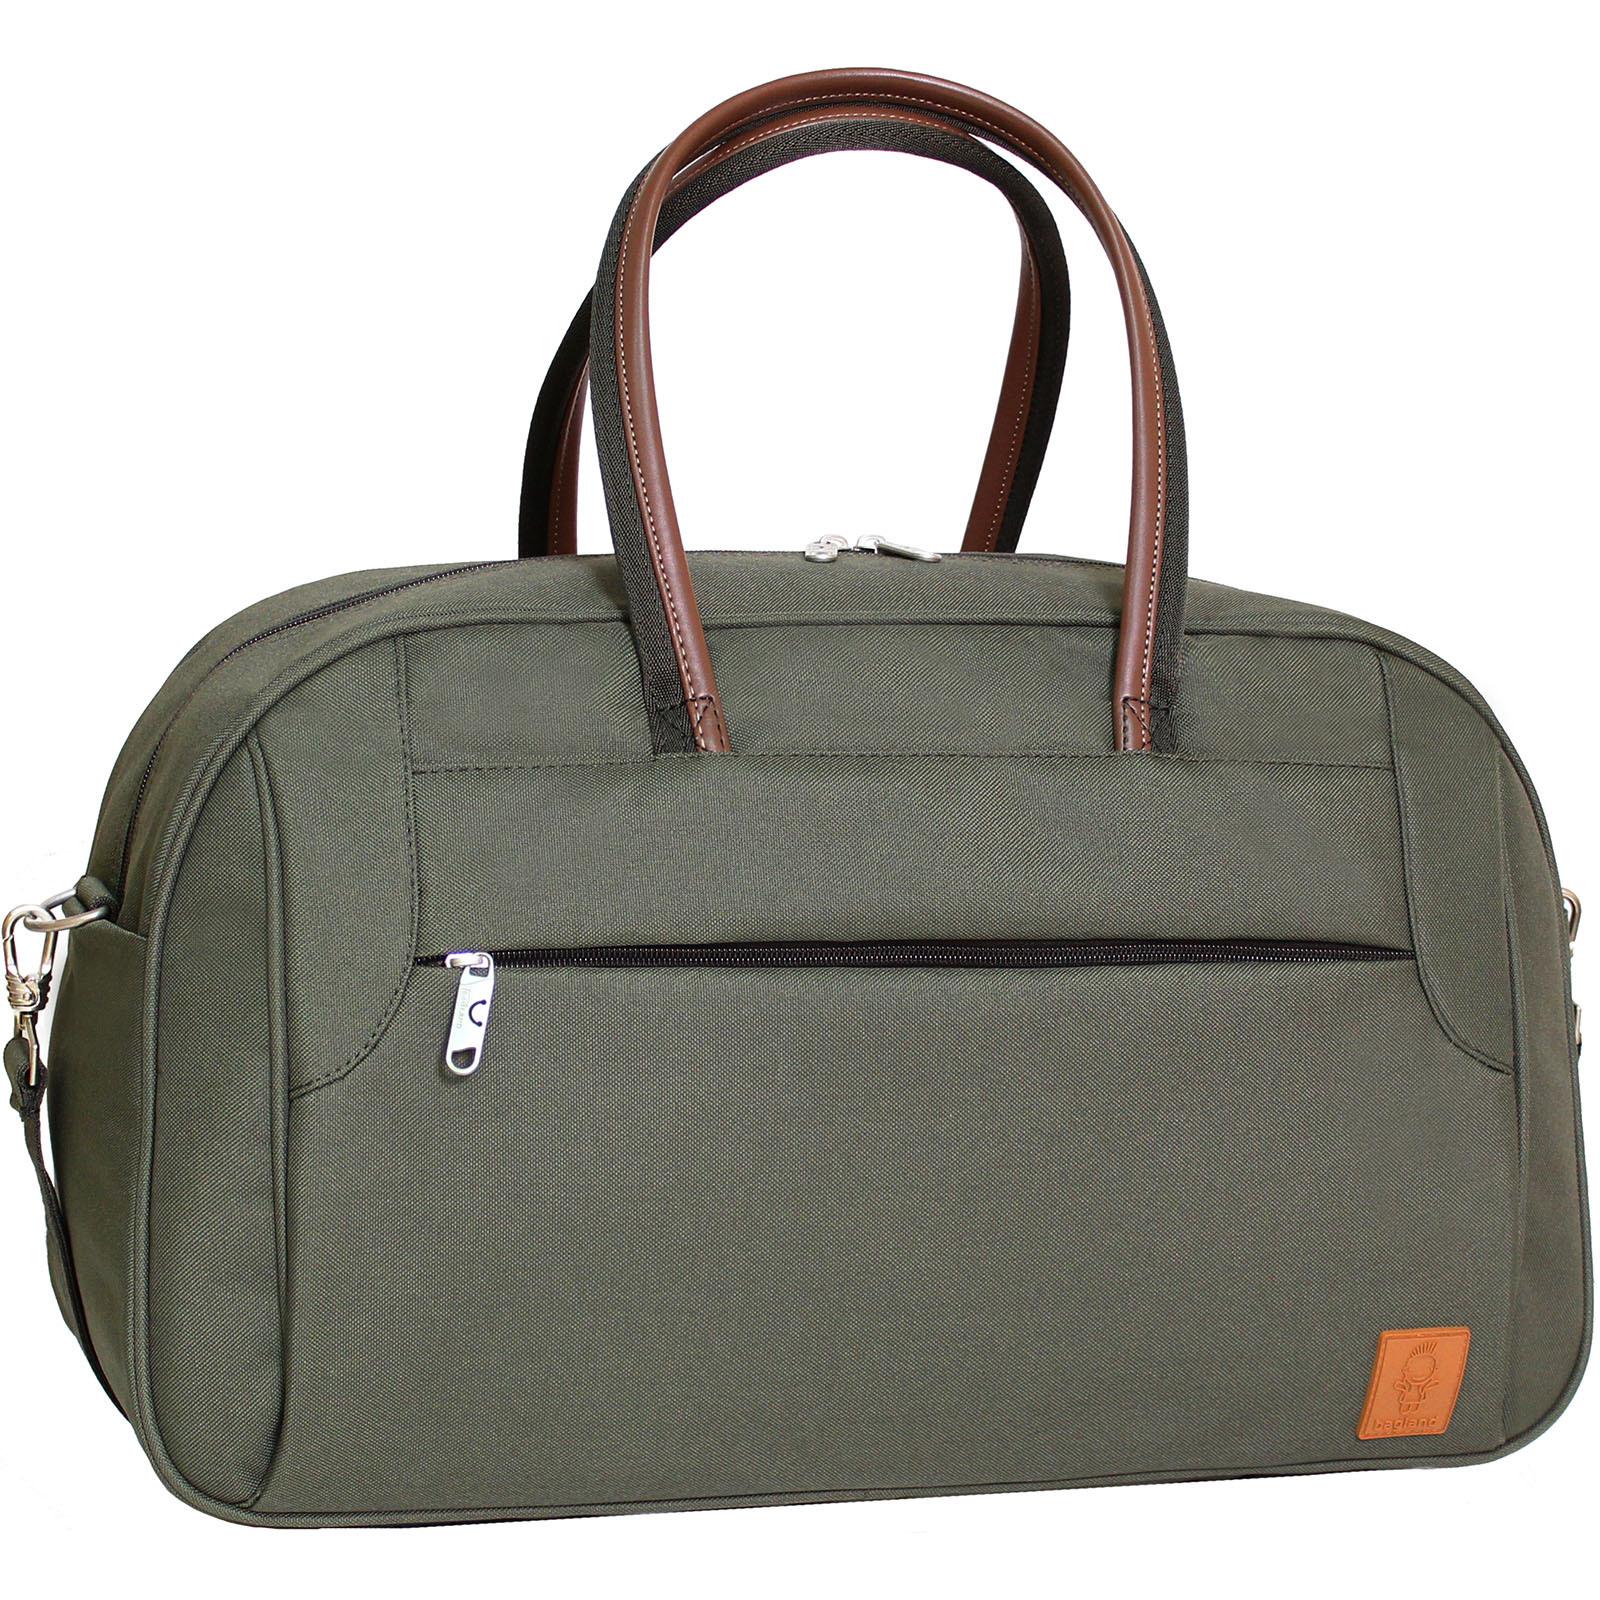 Спортивные сумки Сумка Bagland Тунис 34 л. Хаки (0039066) IMG_8979.JPG